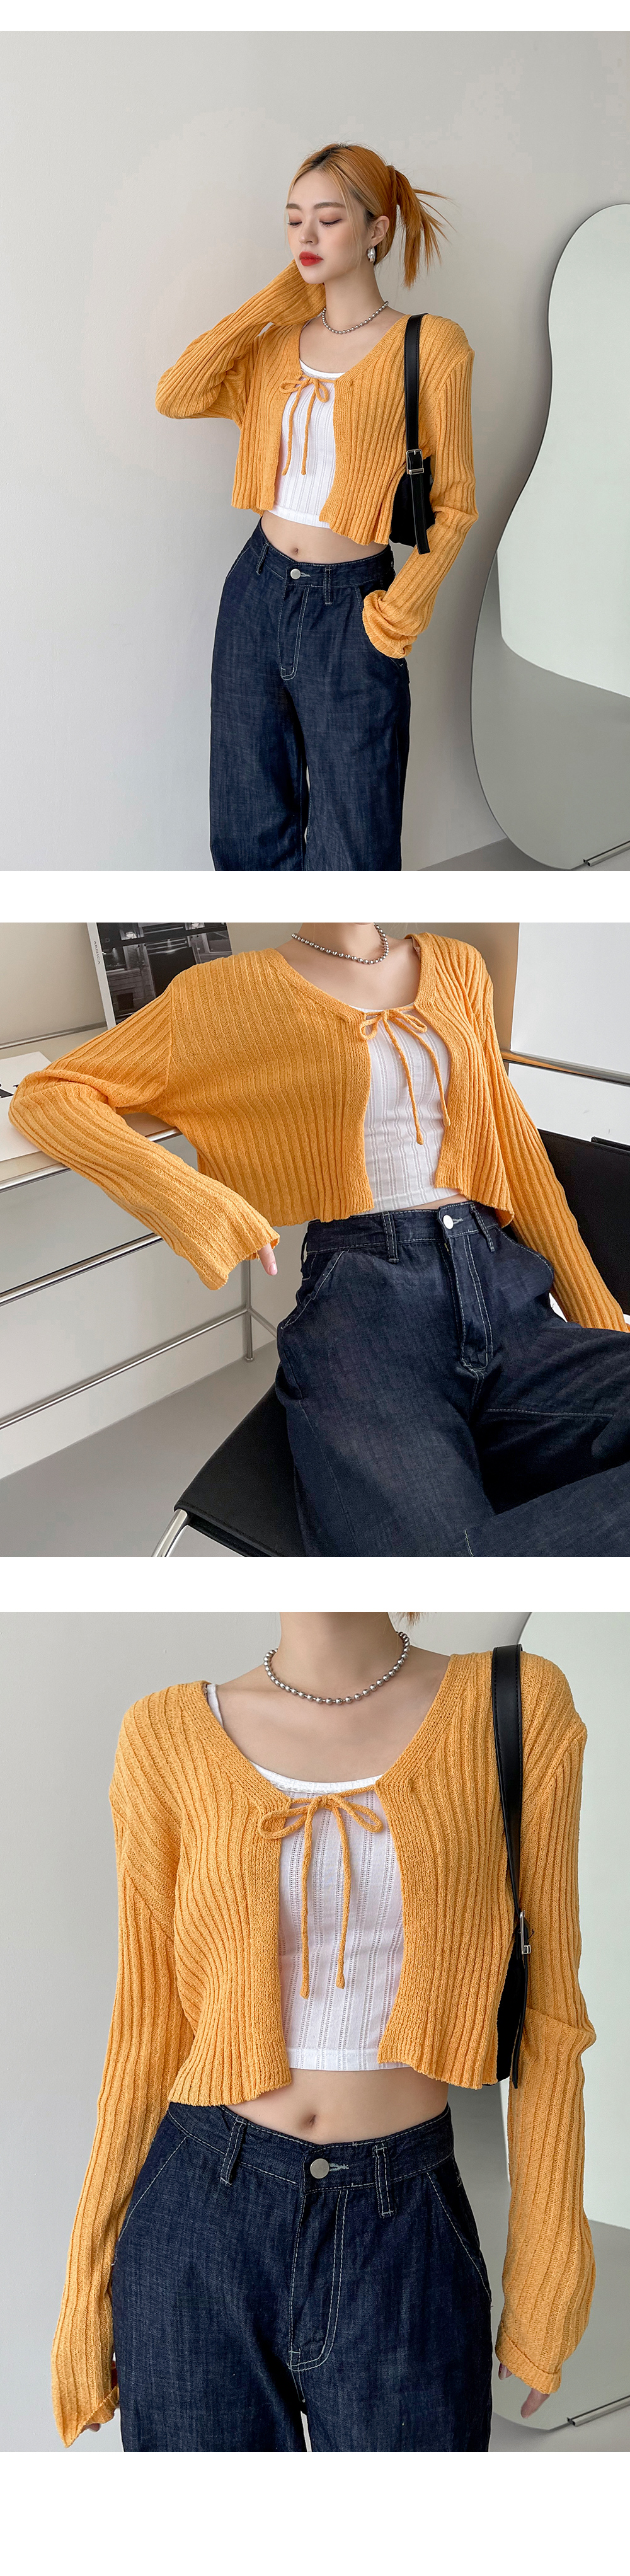 Prican Ribbon Knitwear Cardigan